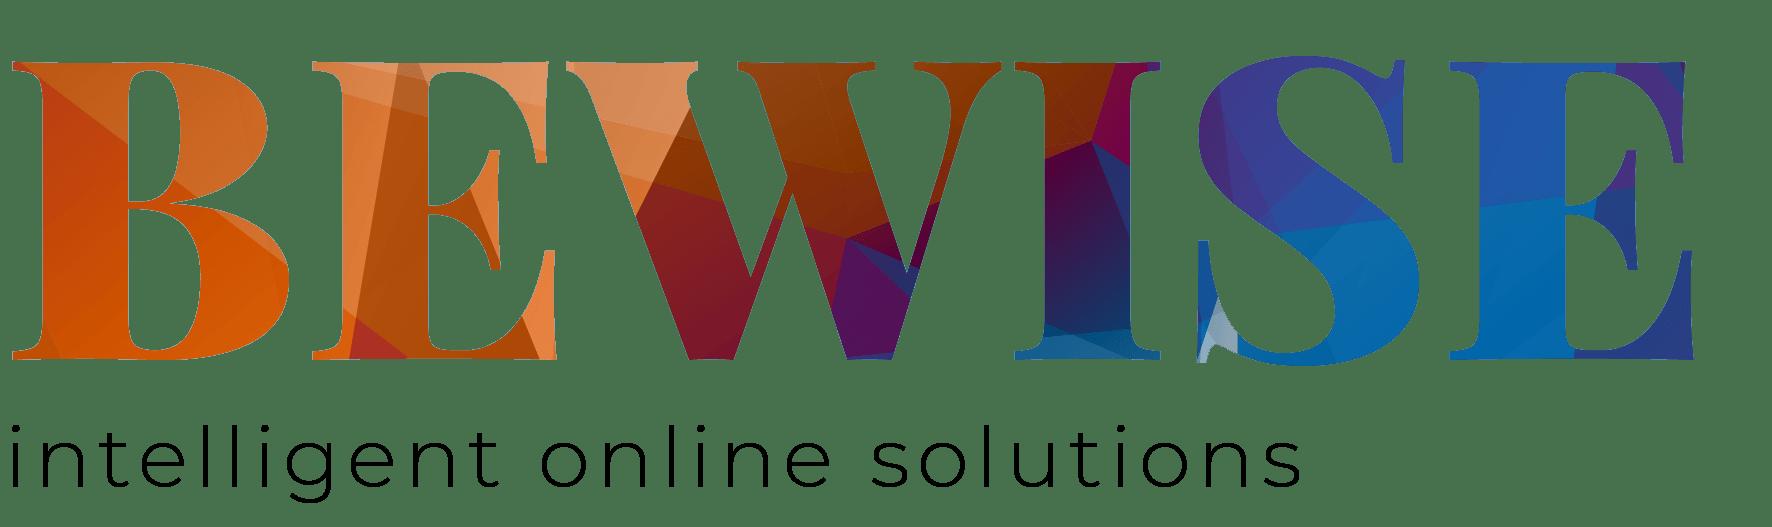 bewise-logo-intelligent-online-solutions-kleur